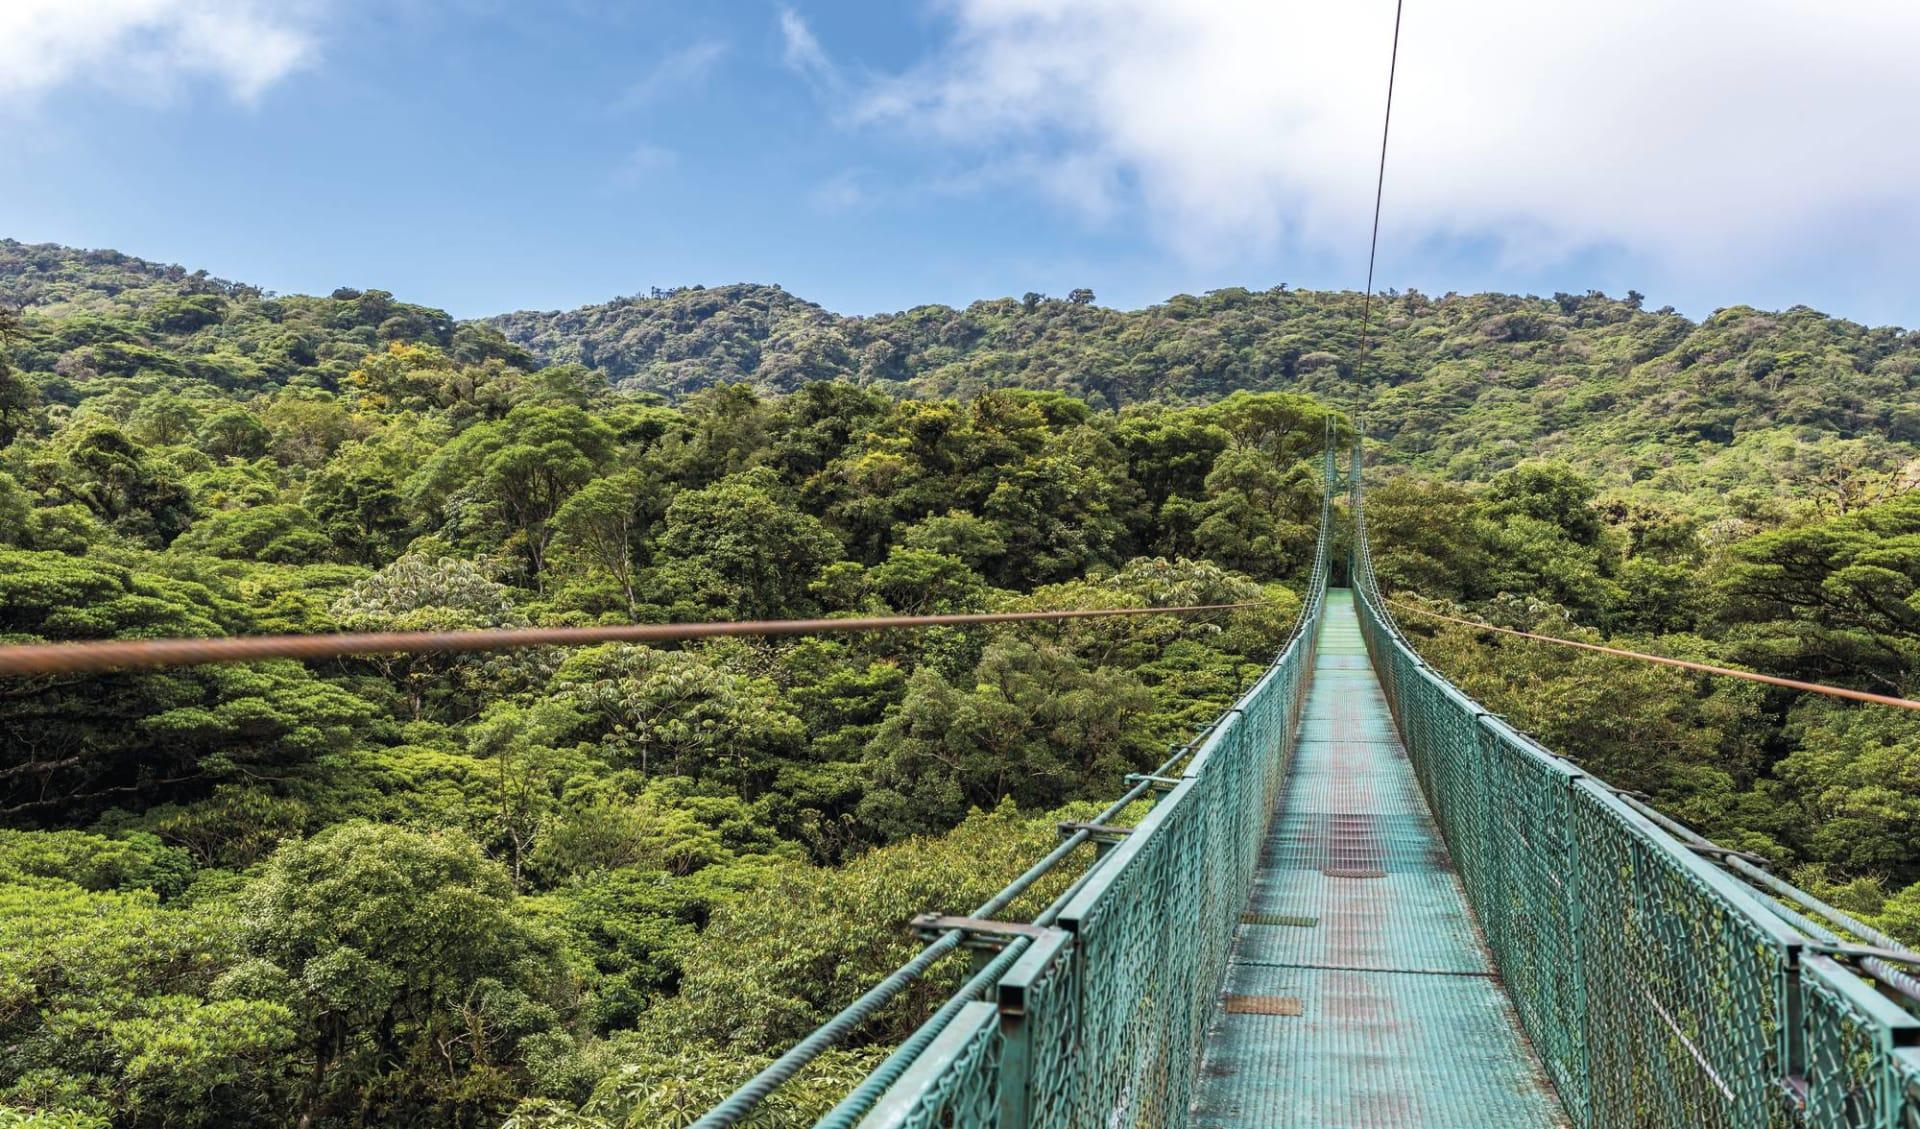 Mietwagenreise 4 X 4 Entdeckertour ab San José City: Costa Rica - Monteverde - Hängebrücke